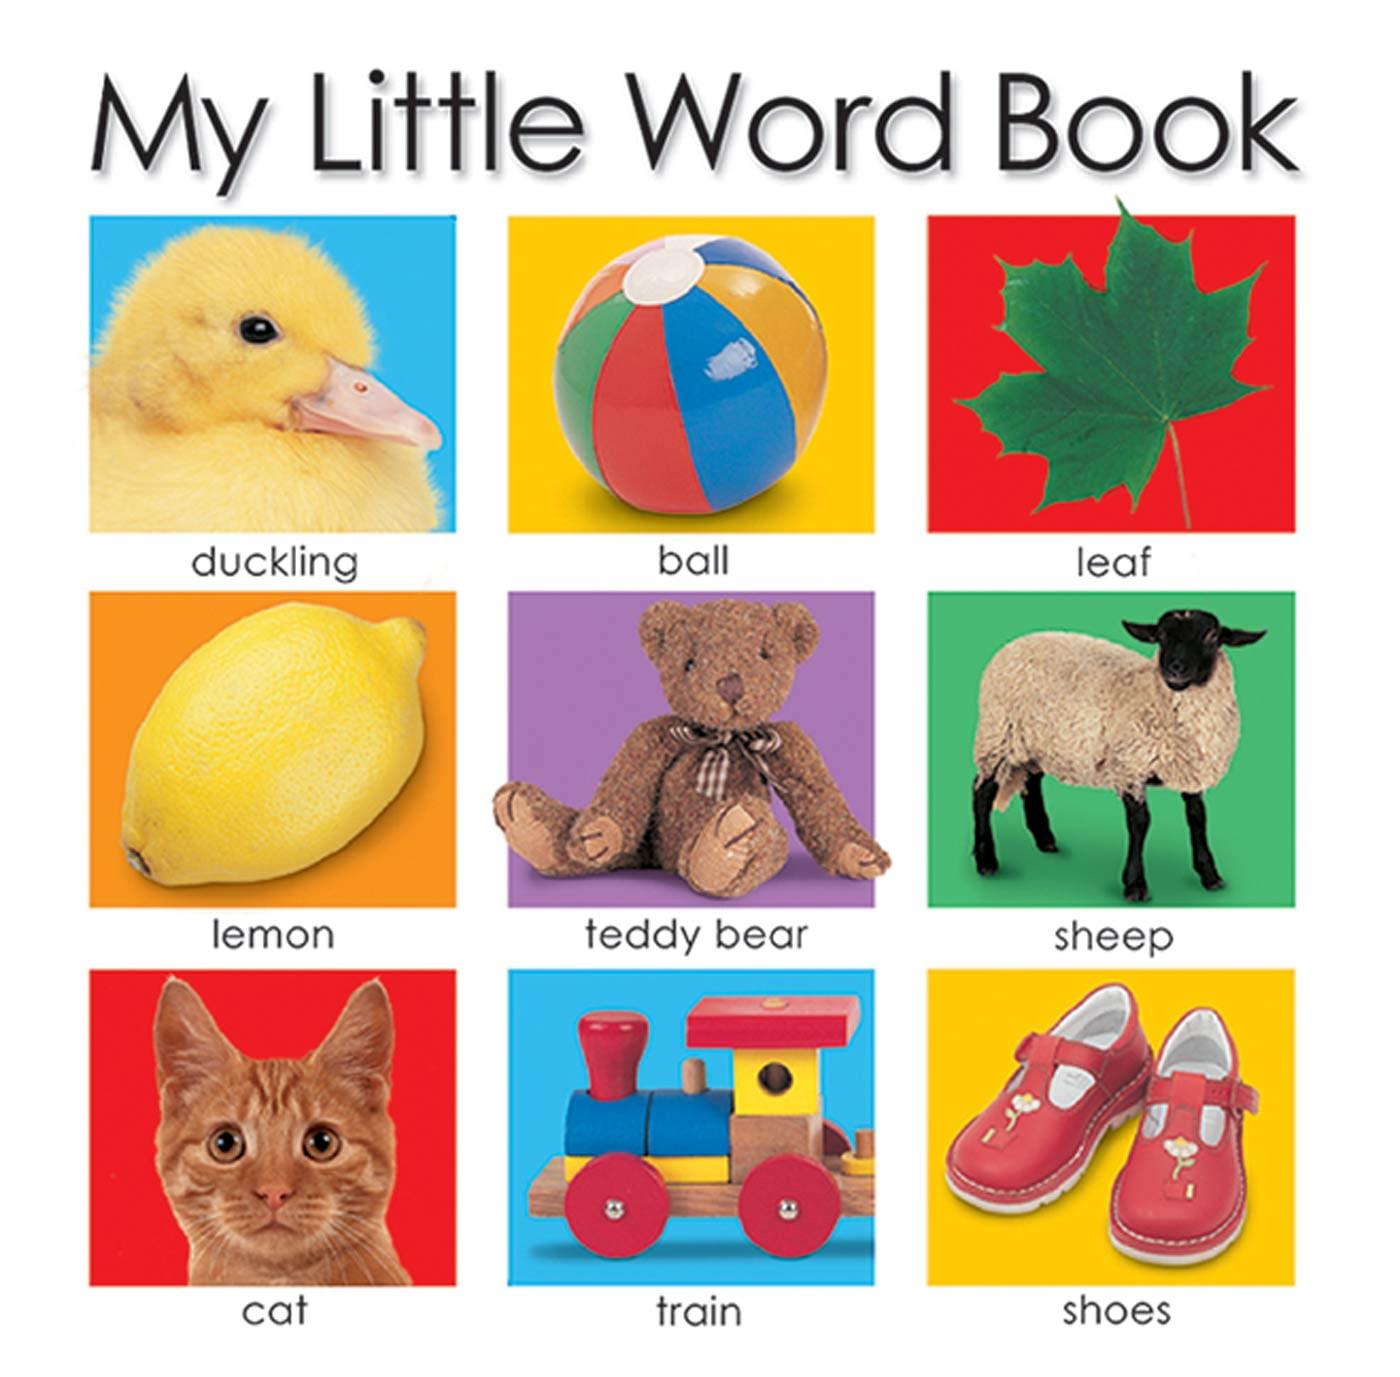 My Little Word Book (Board Book)